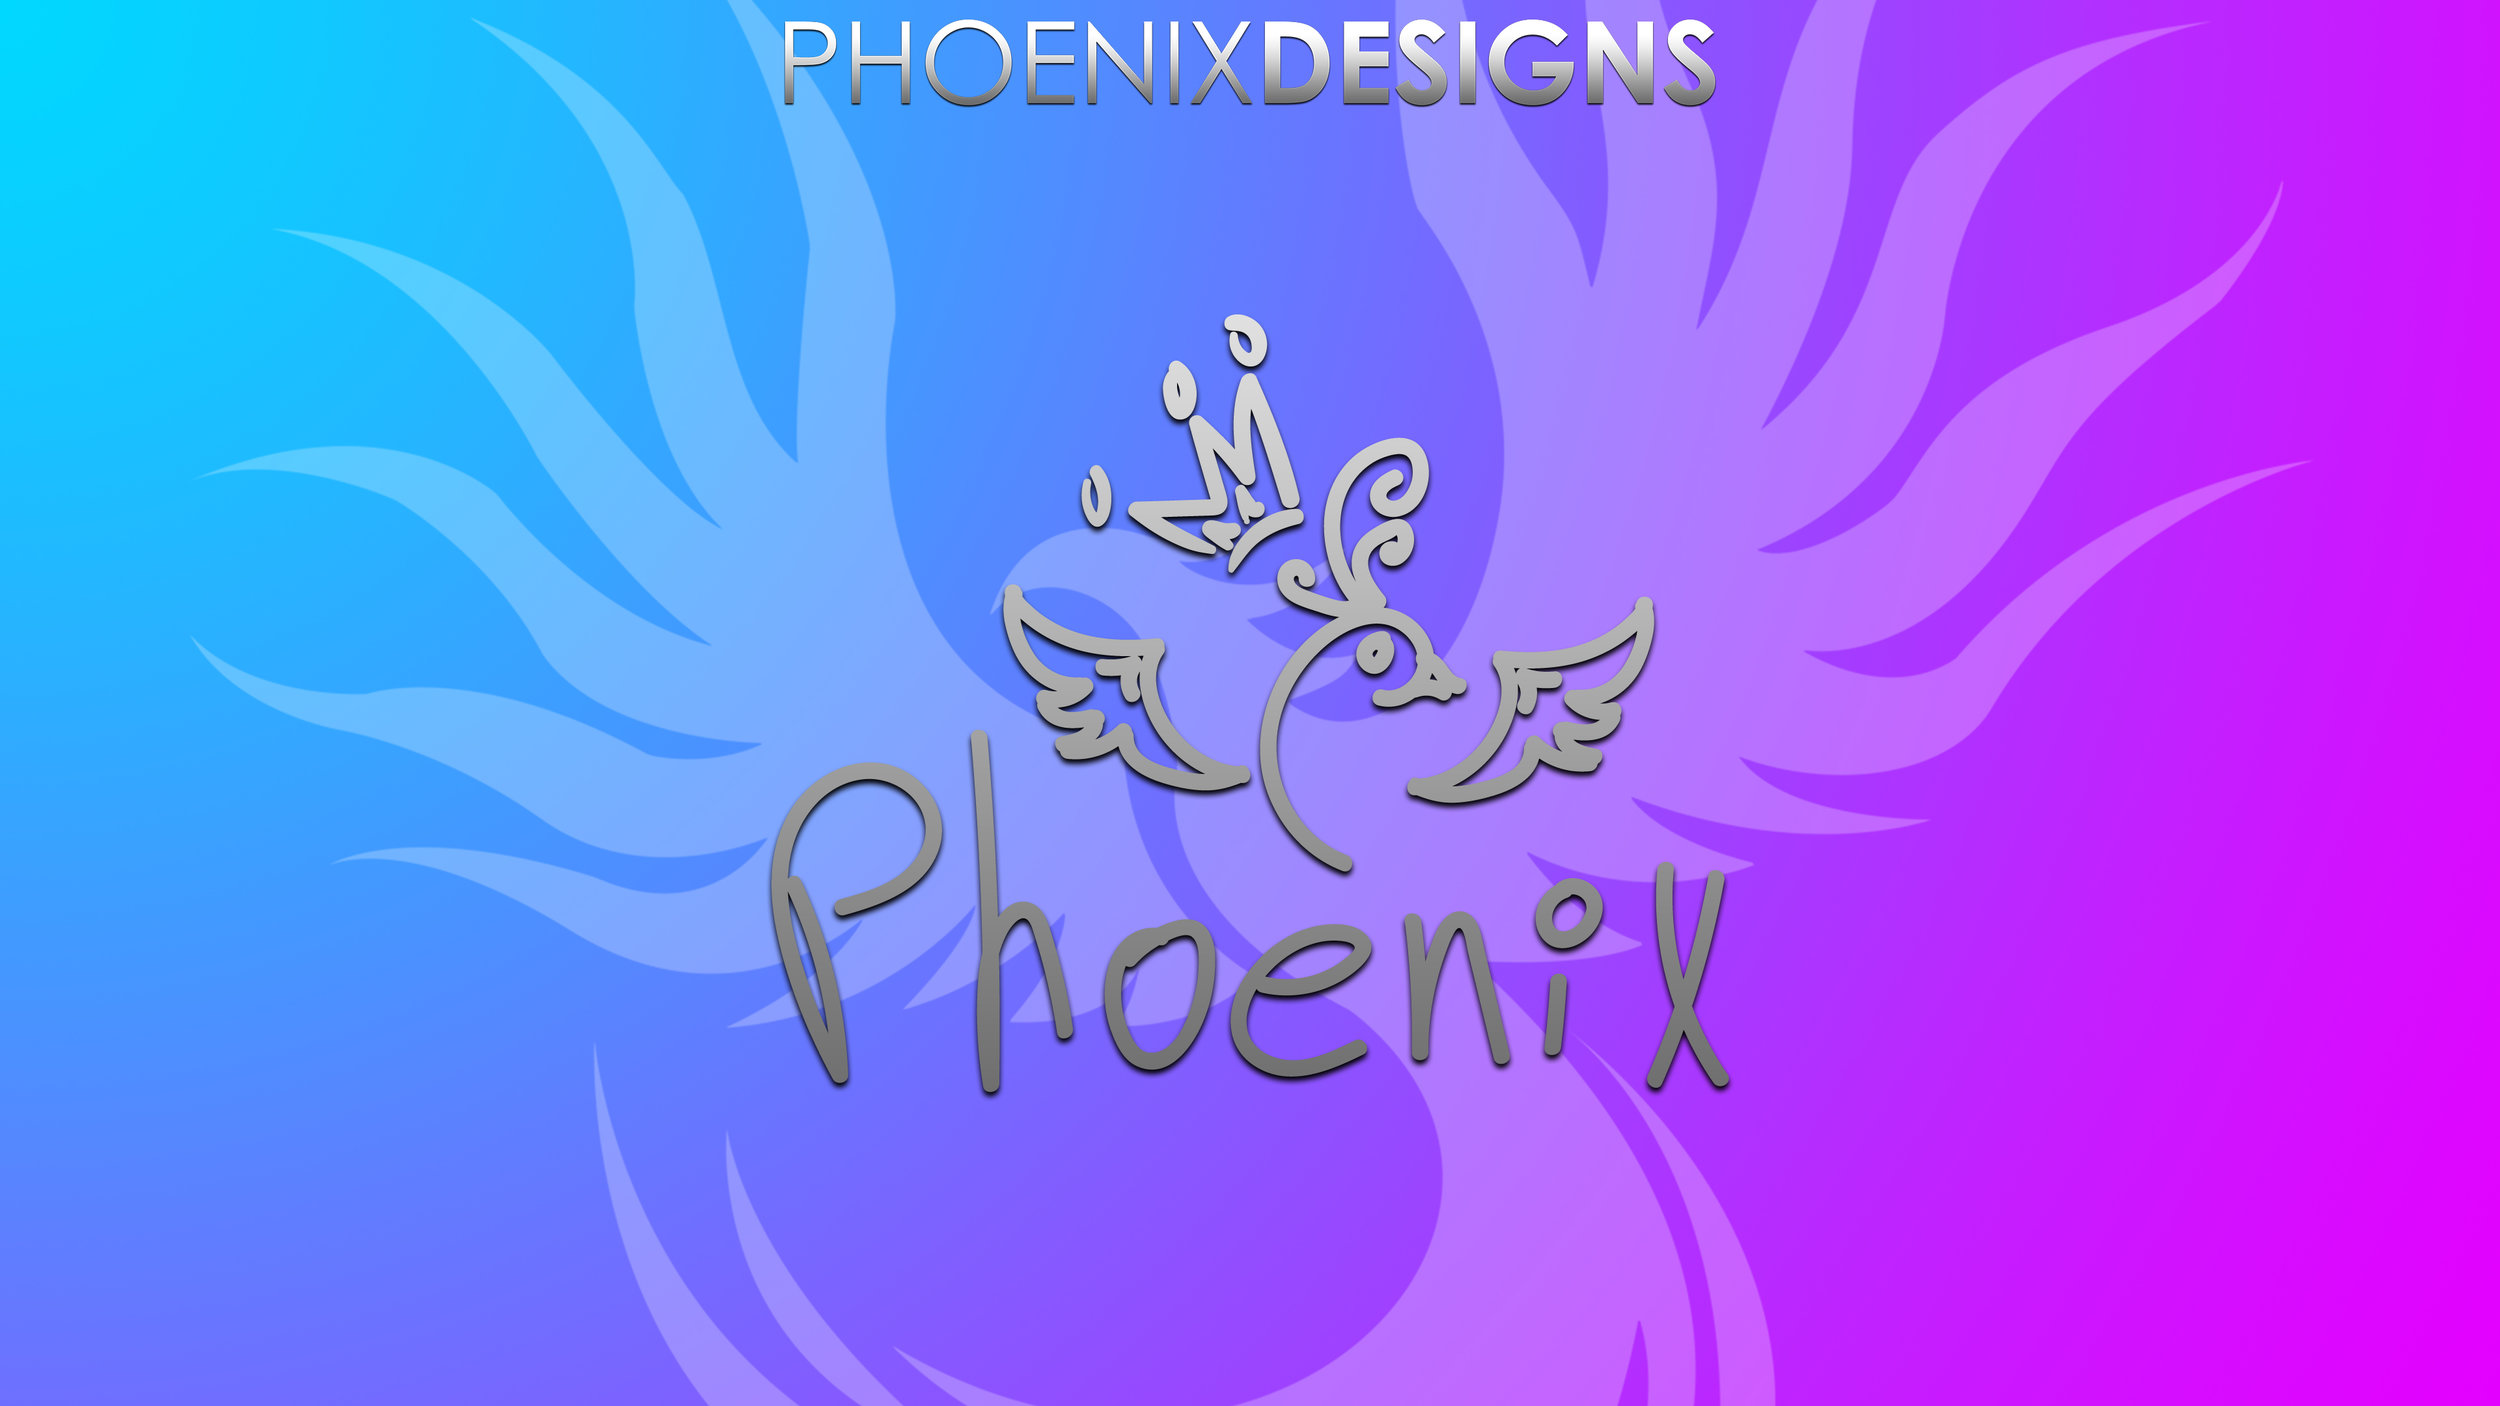 Phoenix - Signature Phoenix.jpg